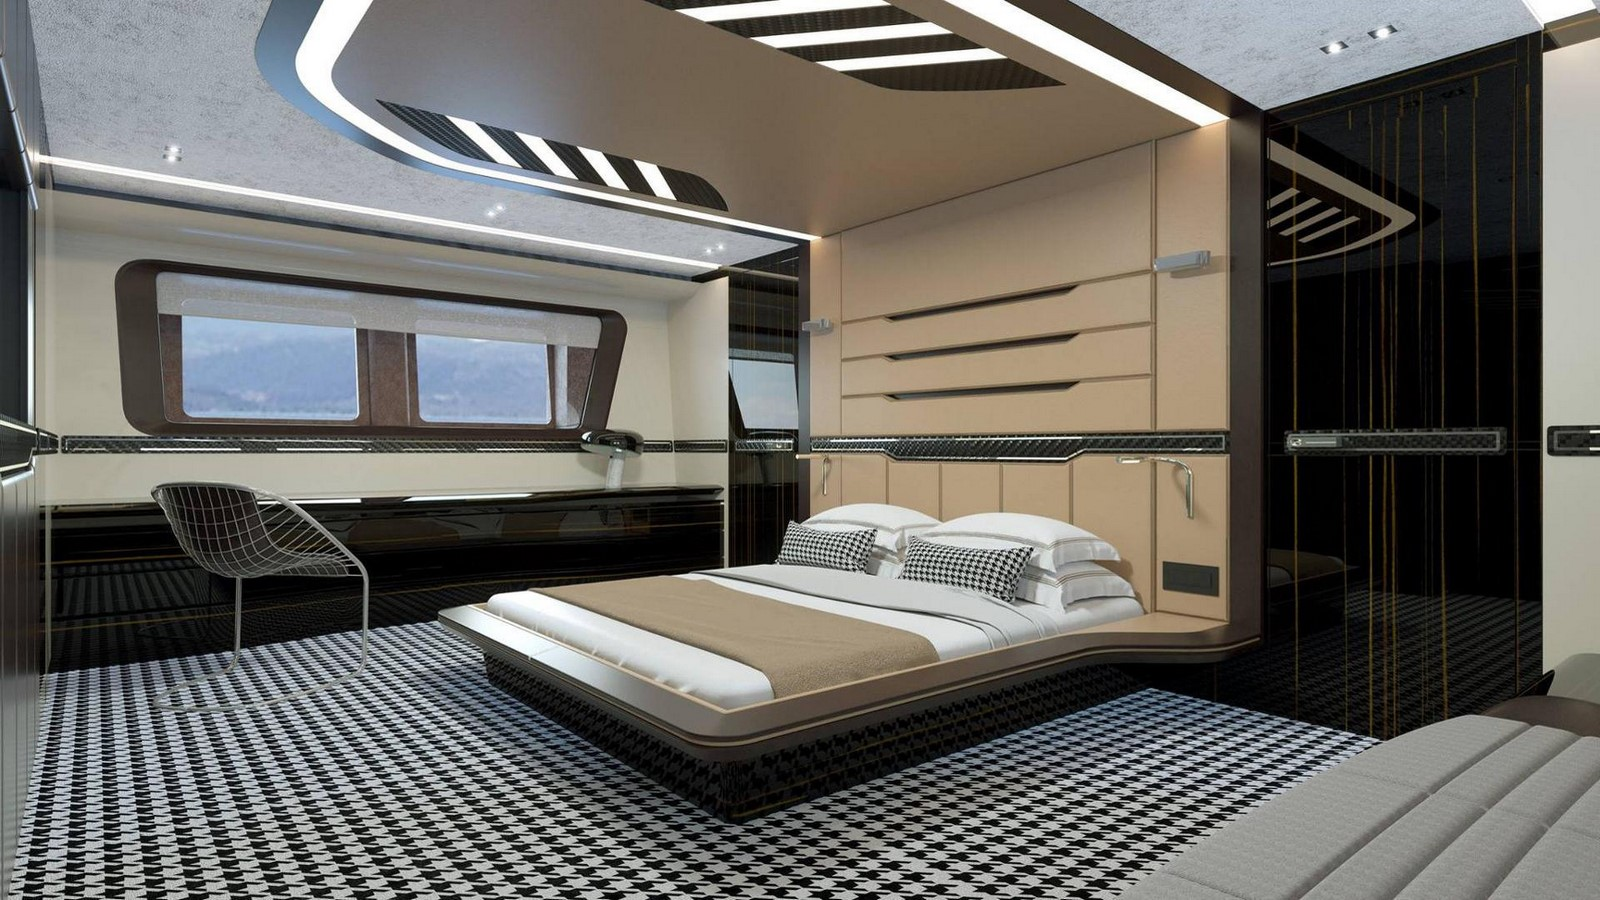 porsche-design-dynamiq-gtt-115-hybrid-superyacht (7)